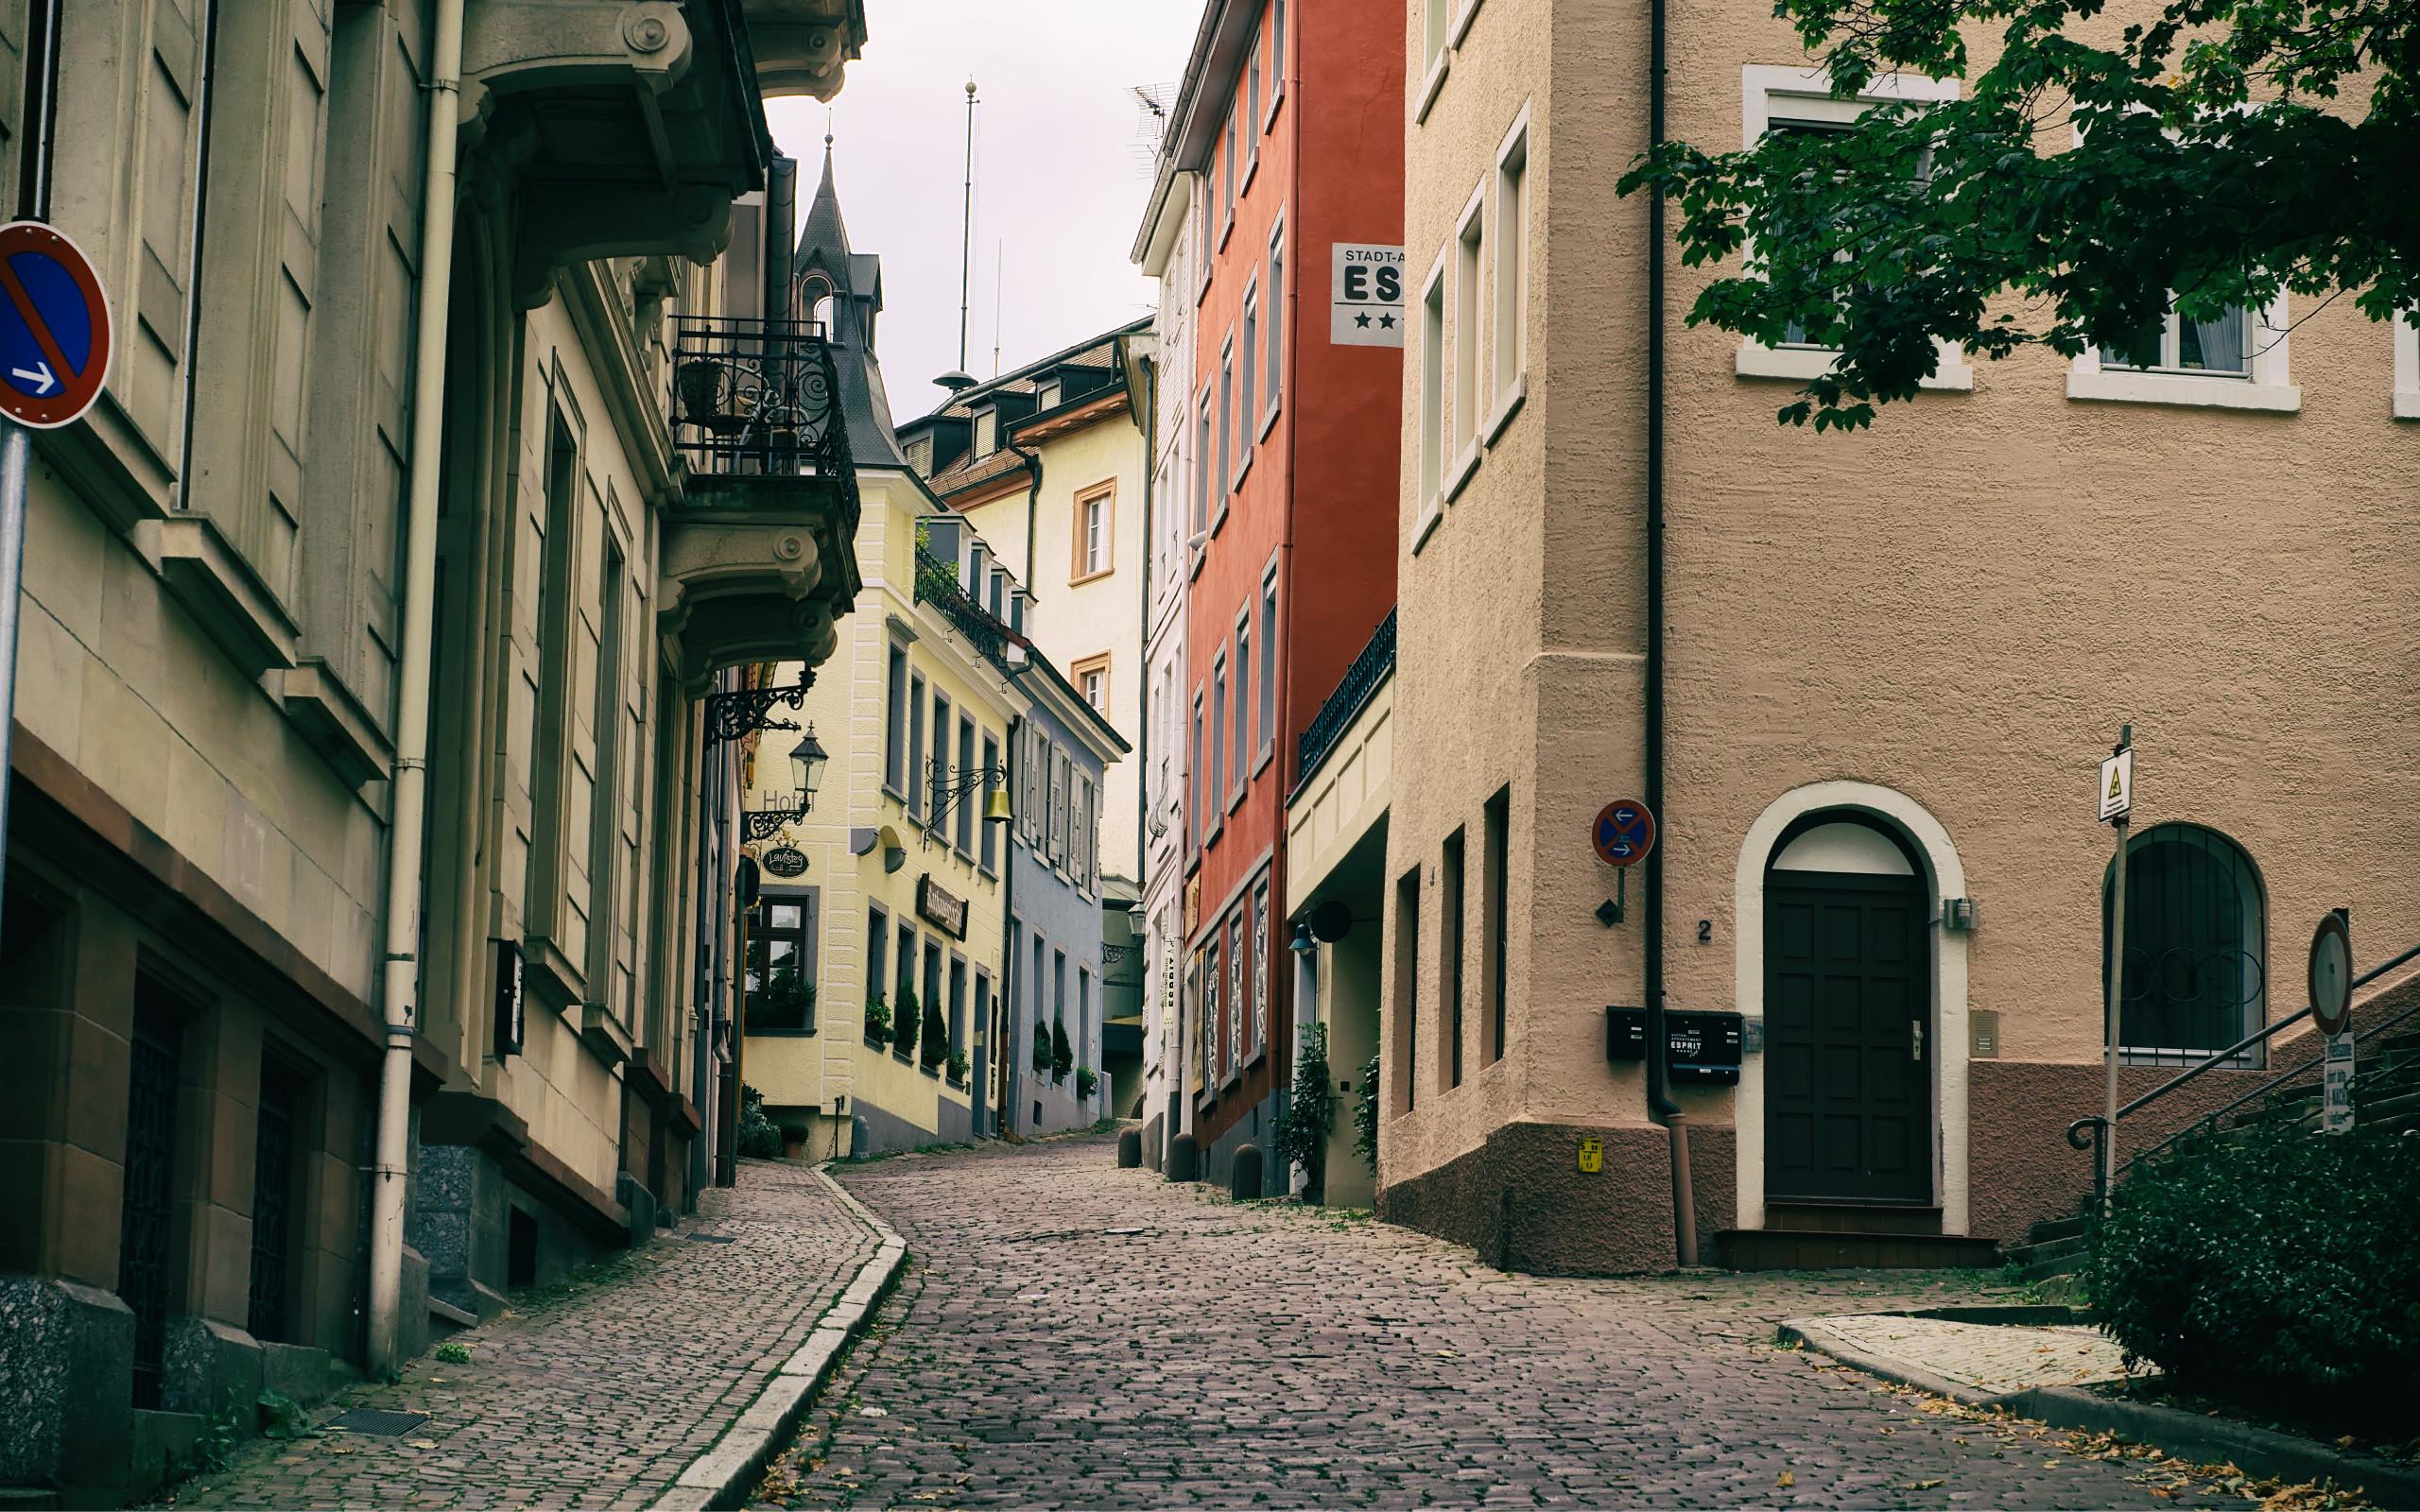 A cobbled backstreet in Baden Baden Germany